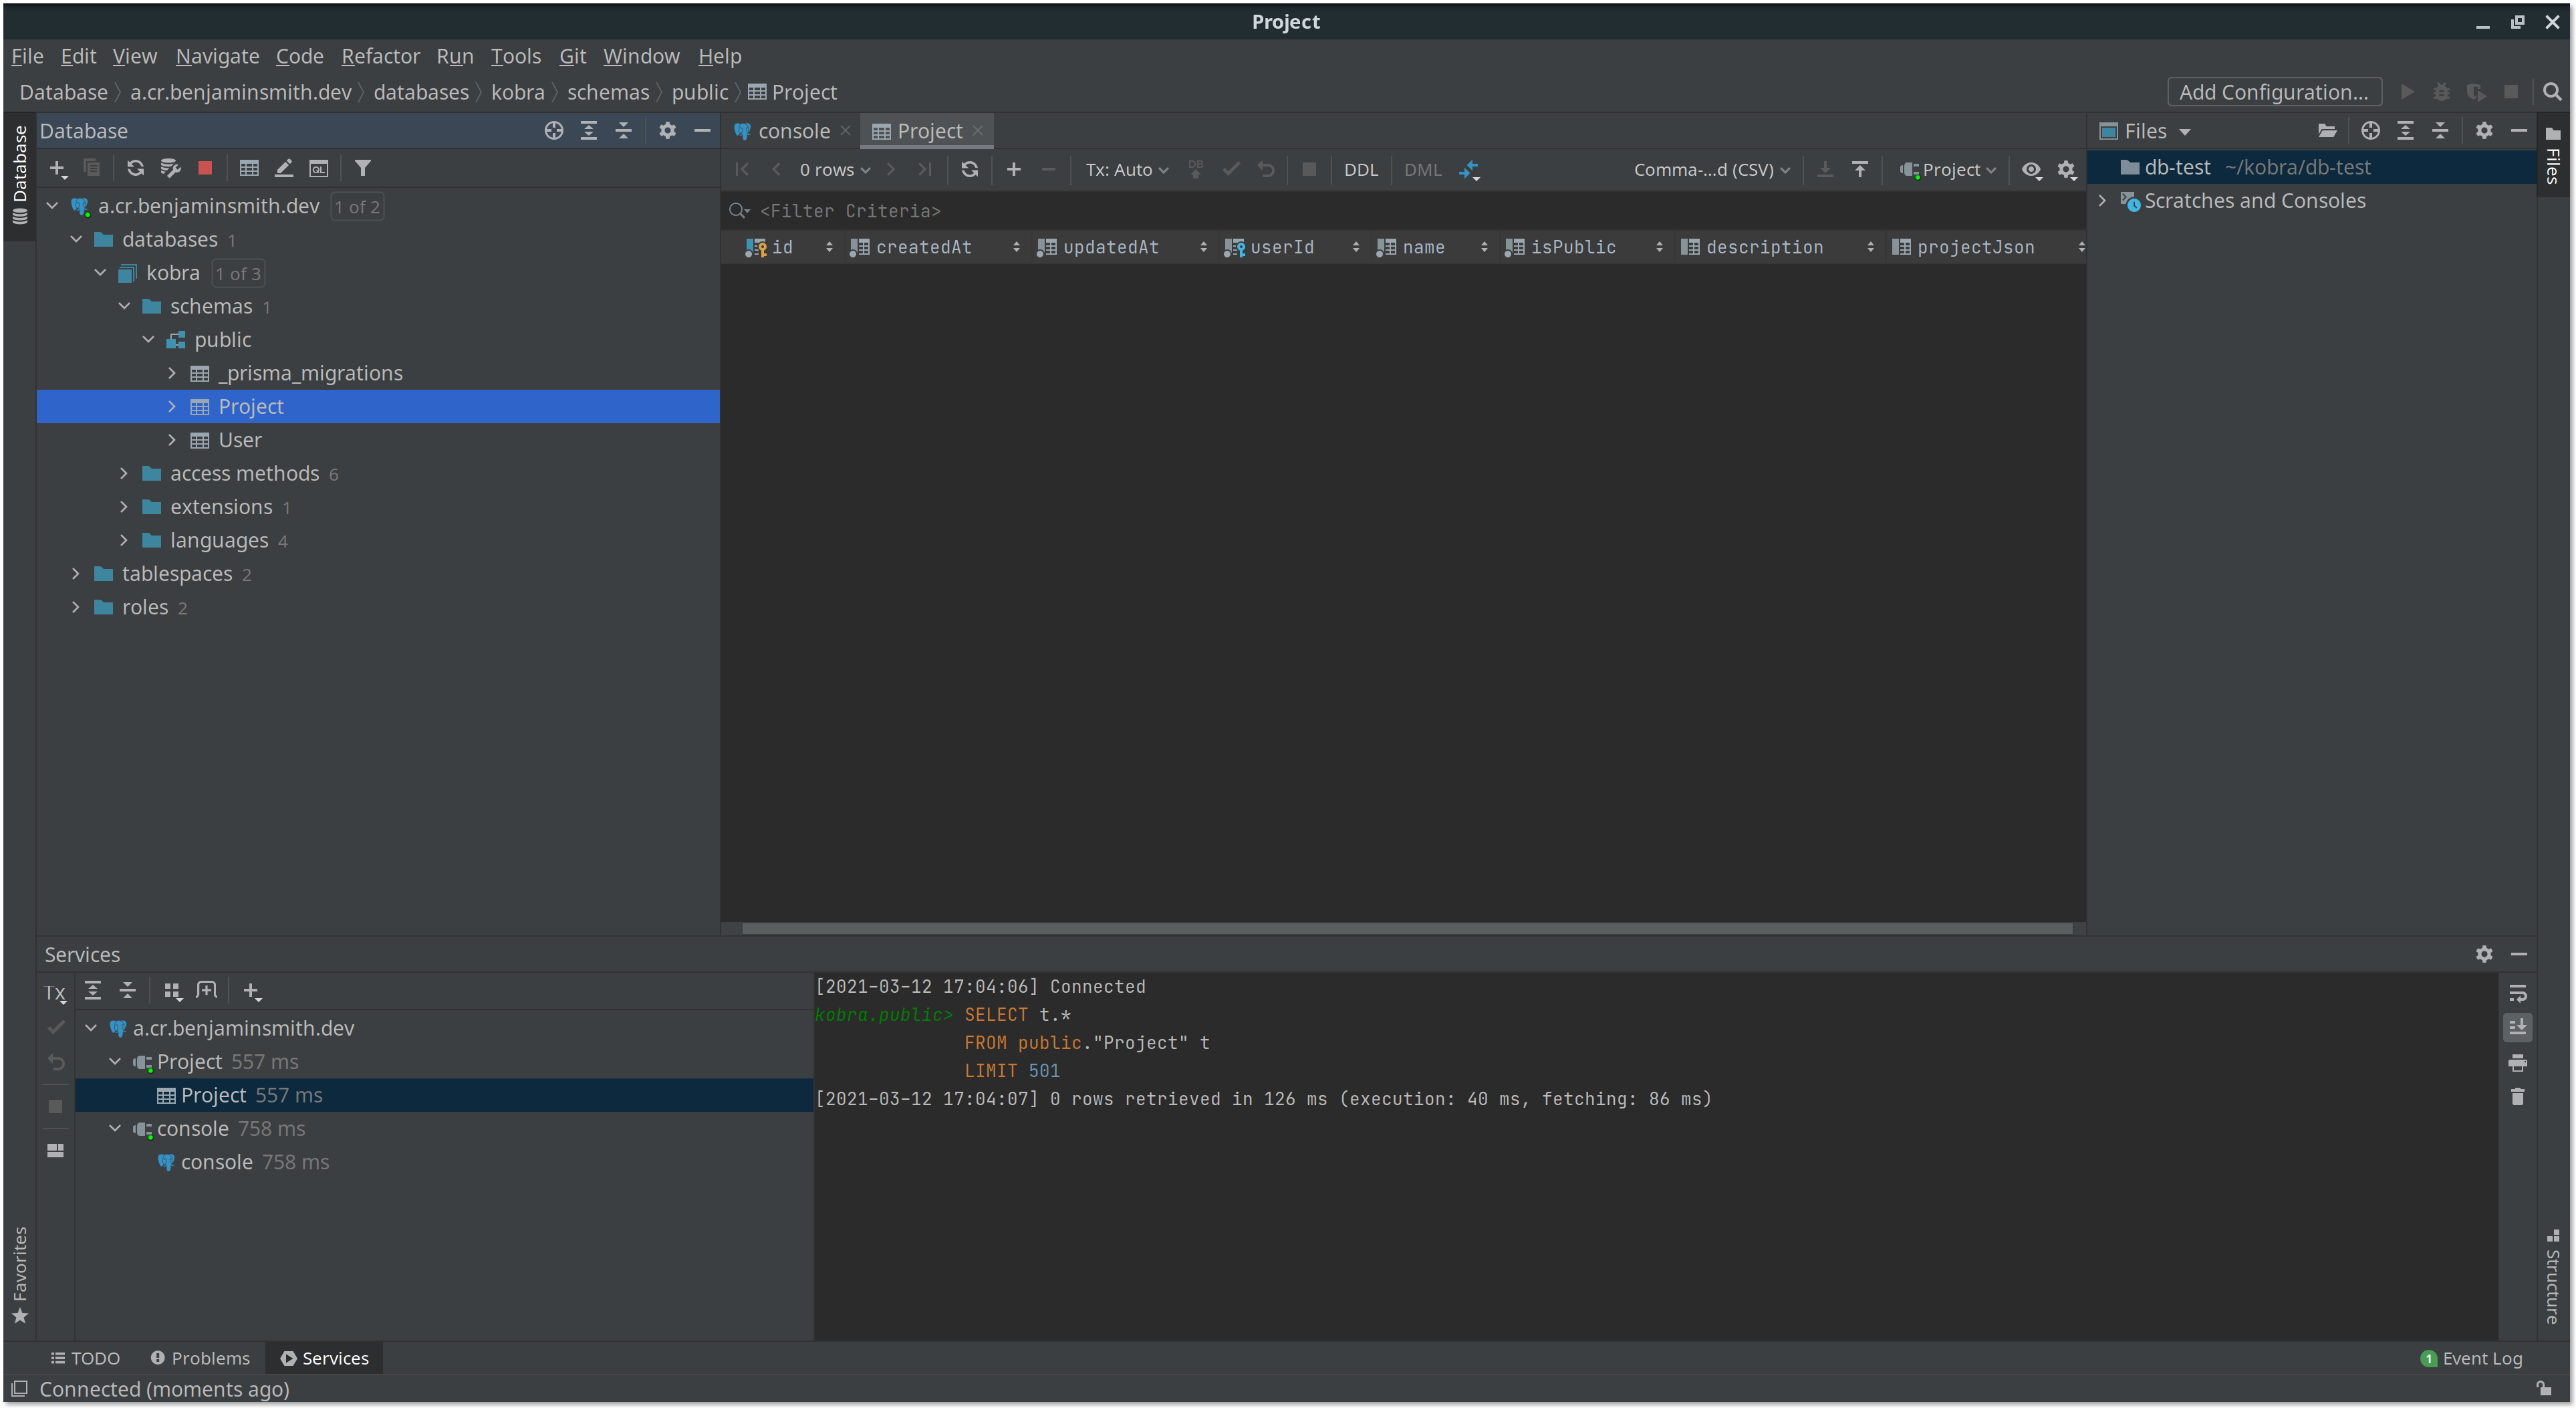 https://cloud-k8exce588-hack-club-bot.vercel.app/0image.png